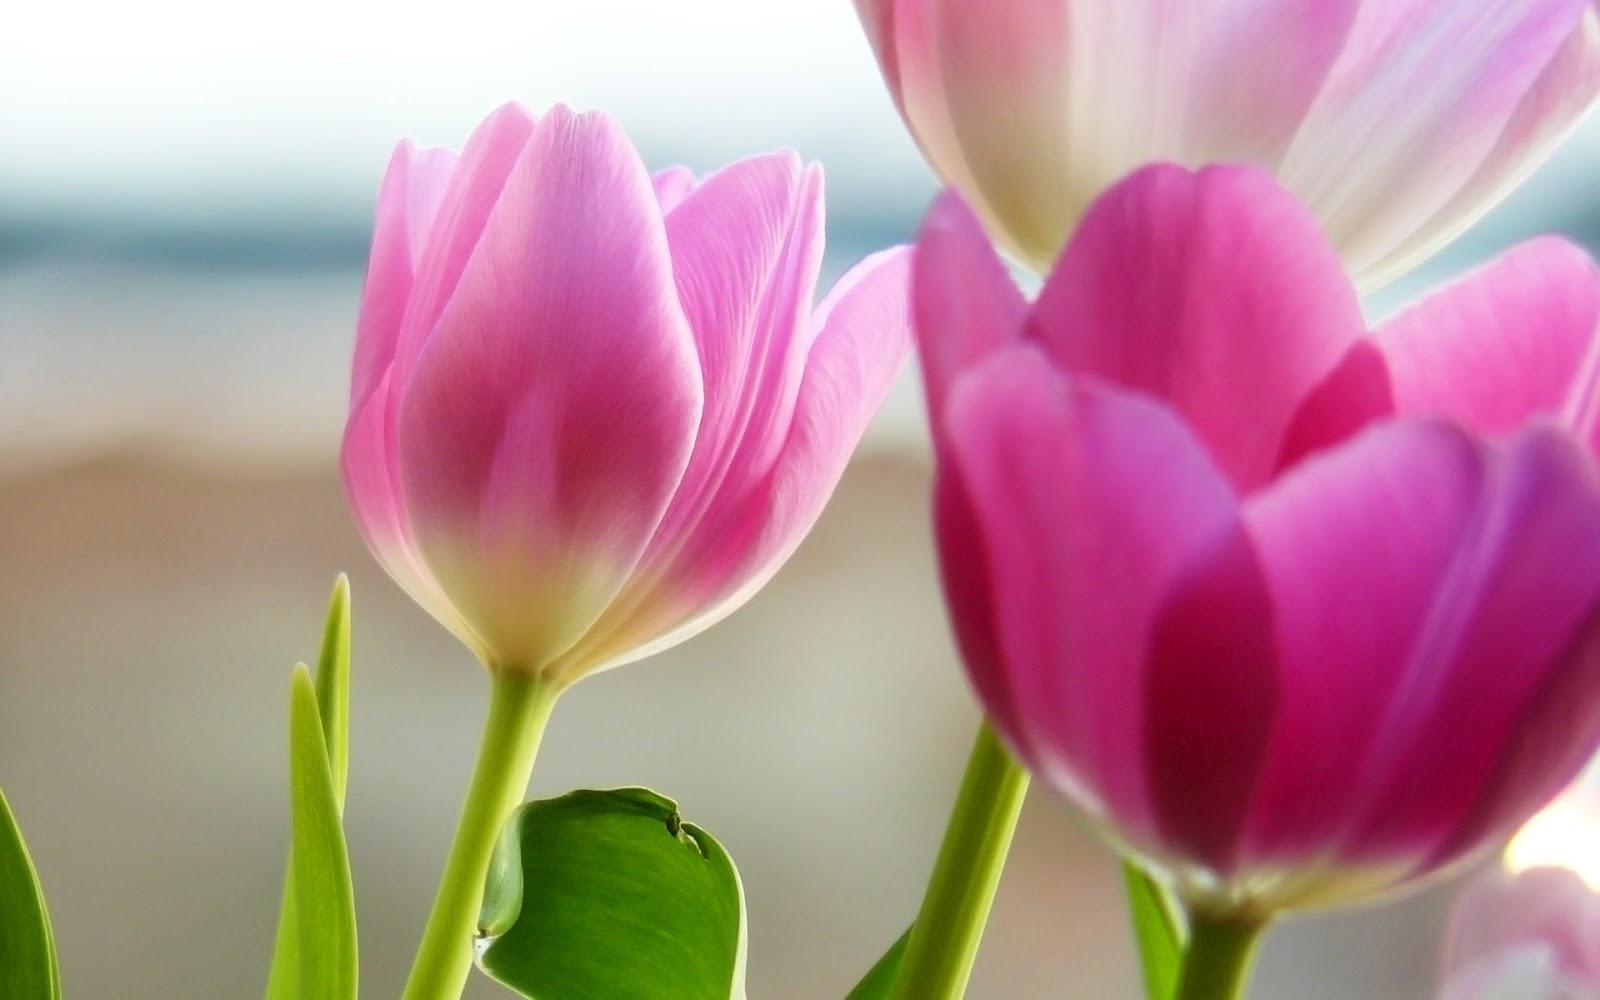 Цветы images yahoo - 8ccf